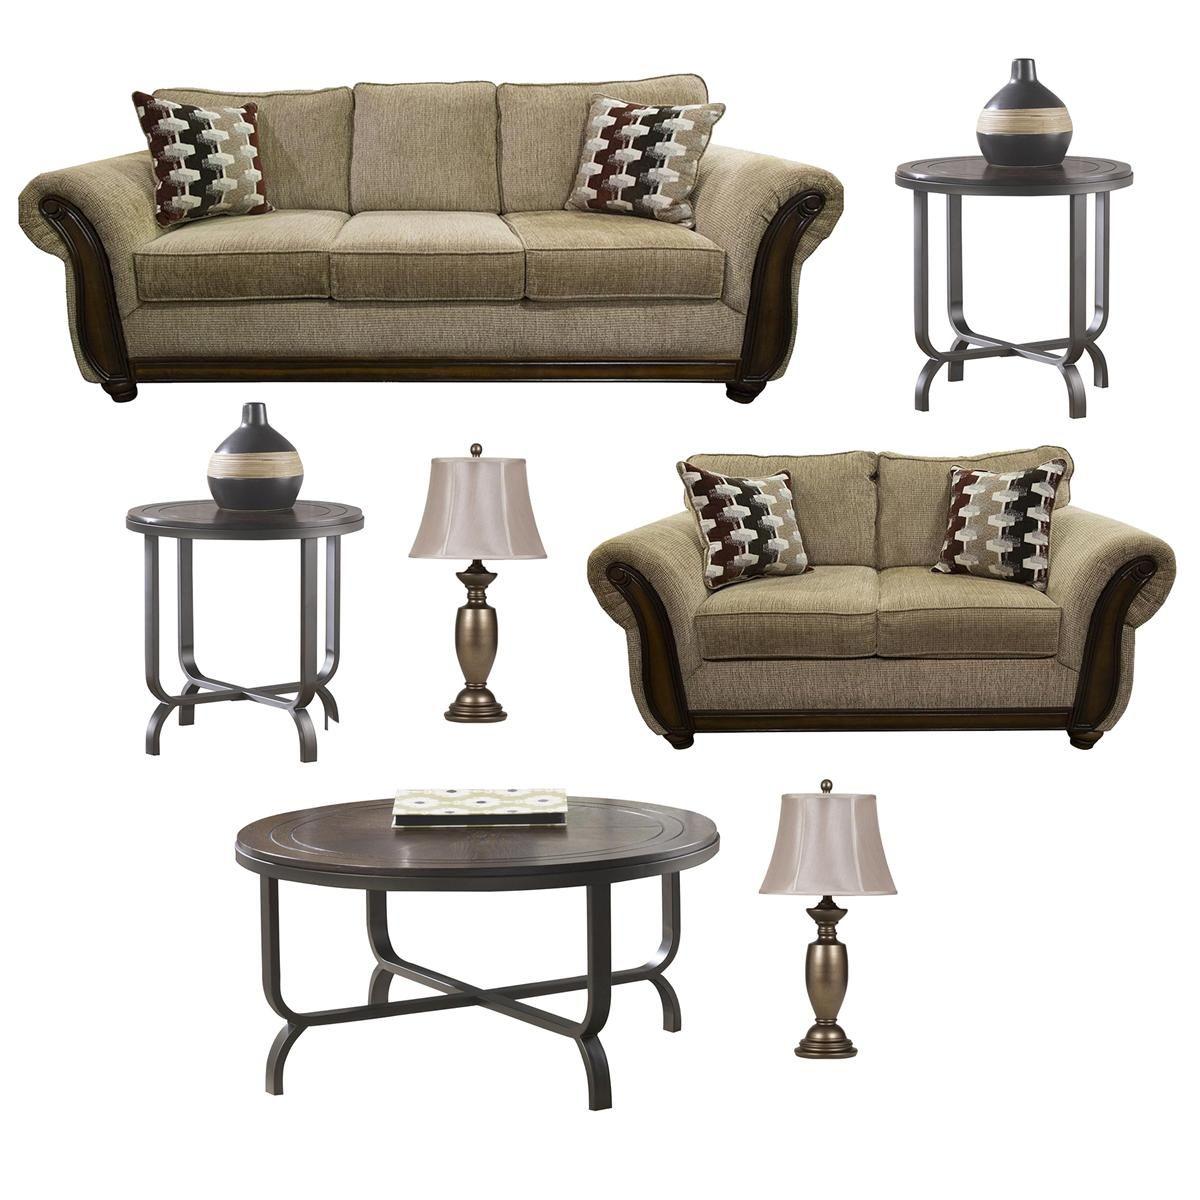 Nebraska Cost 989 Living Room Sets Sofa Set Furniture